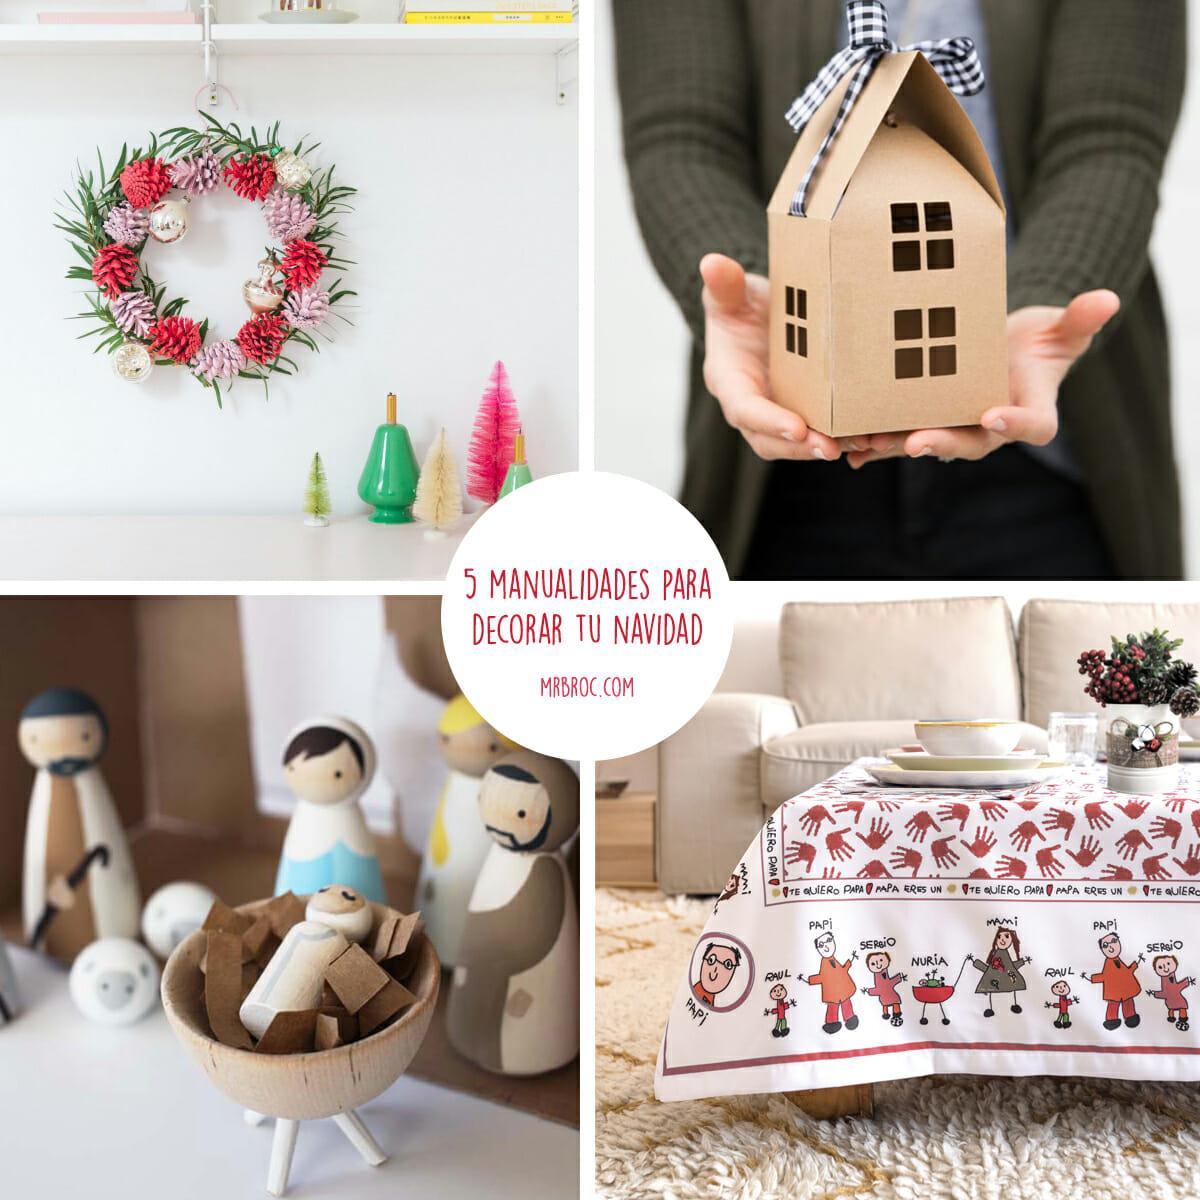 5 manualidades para decorar vuestra casa esta navidad mr - Ideas decoracion navidad manualidades ...